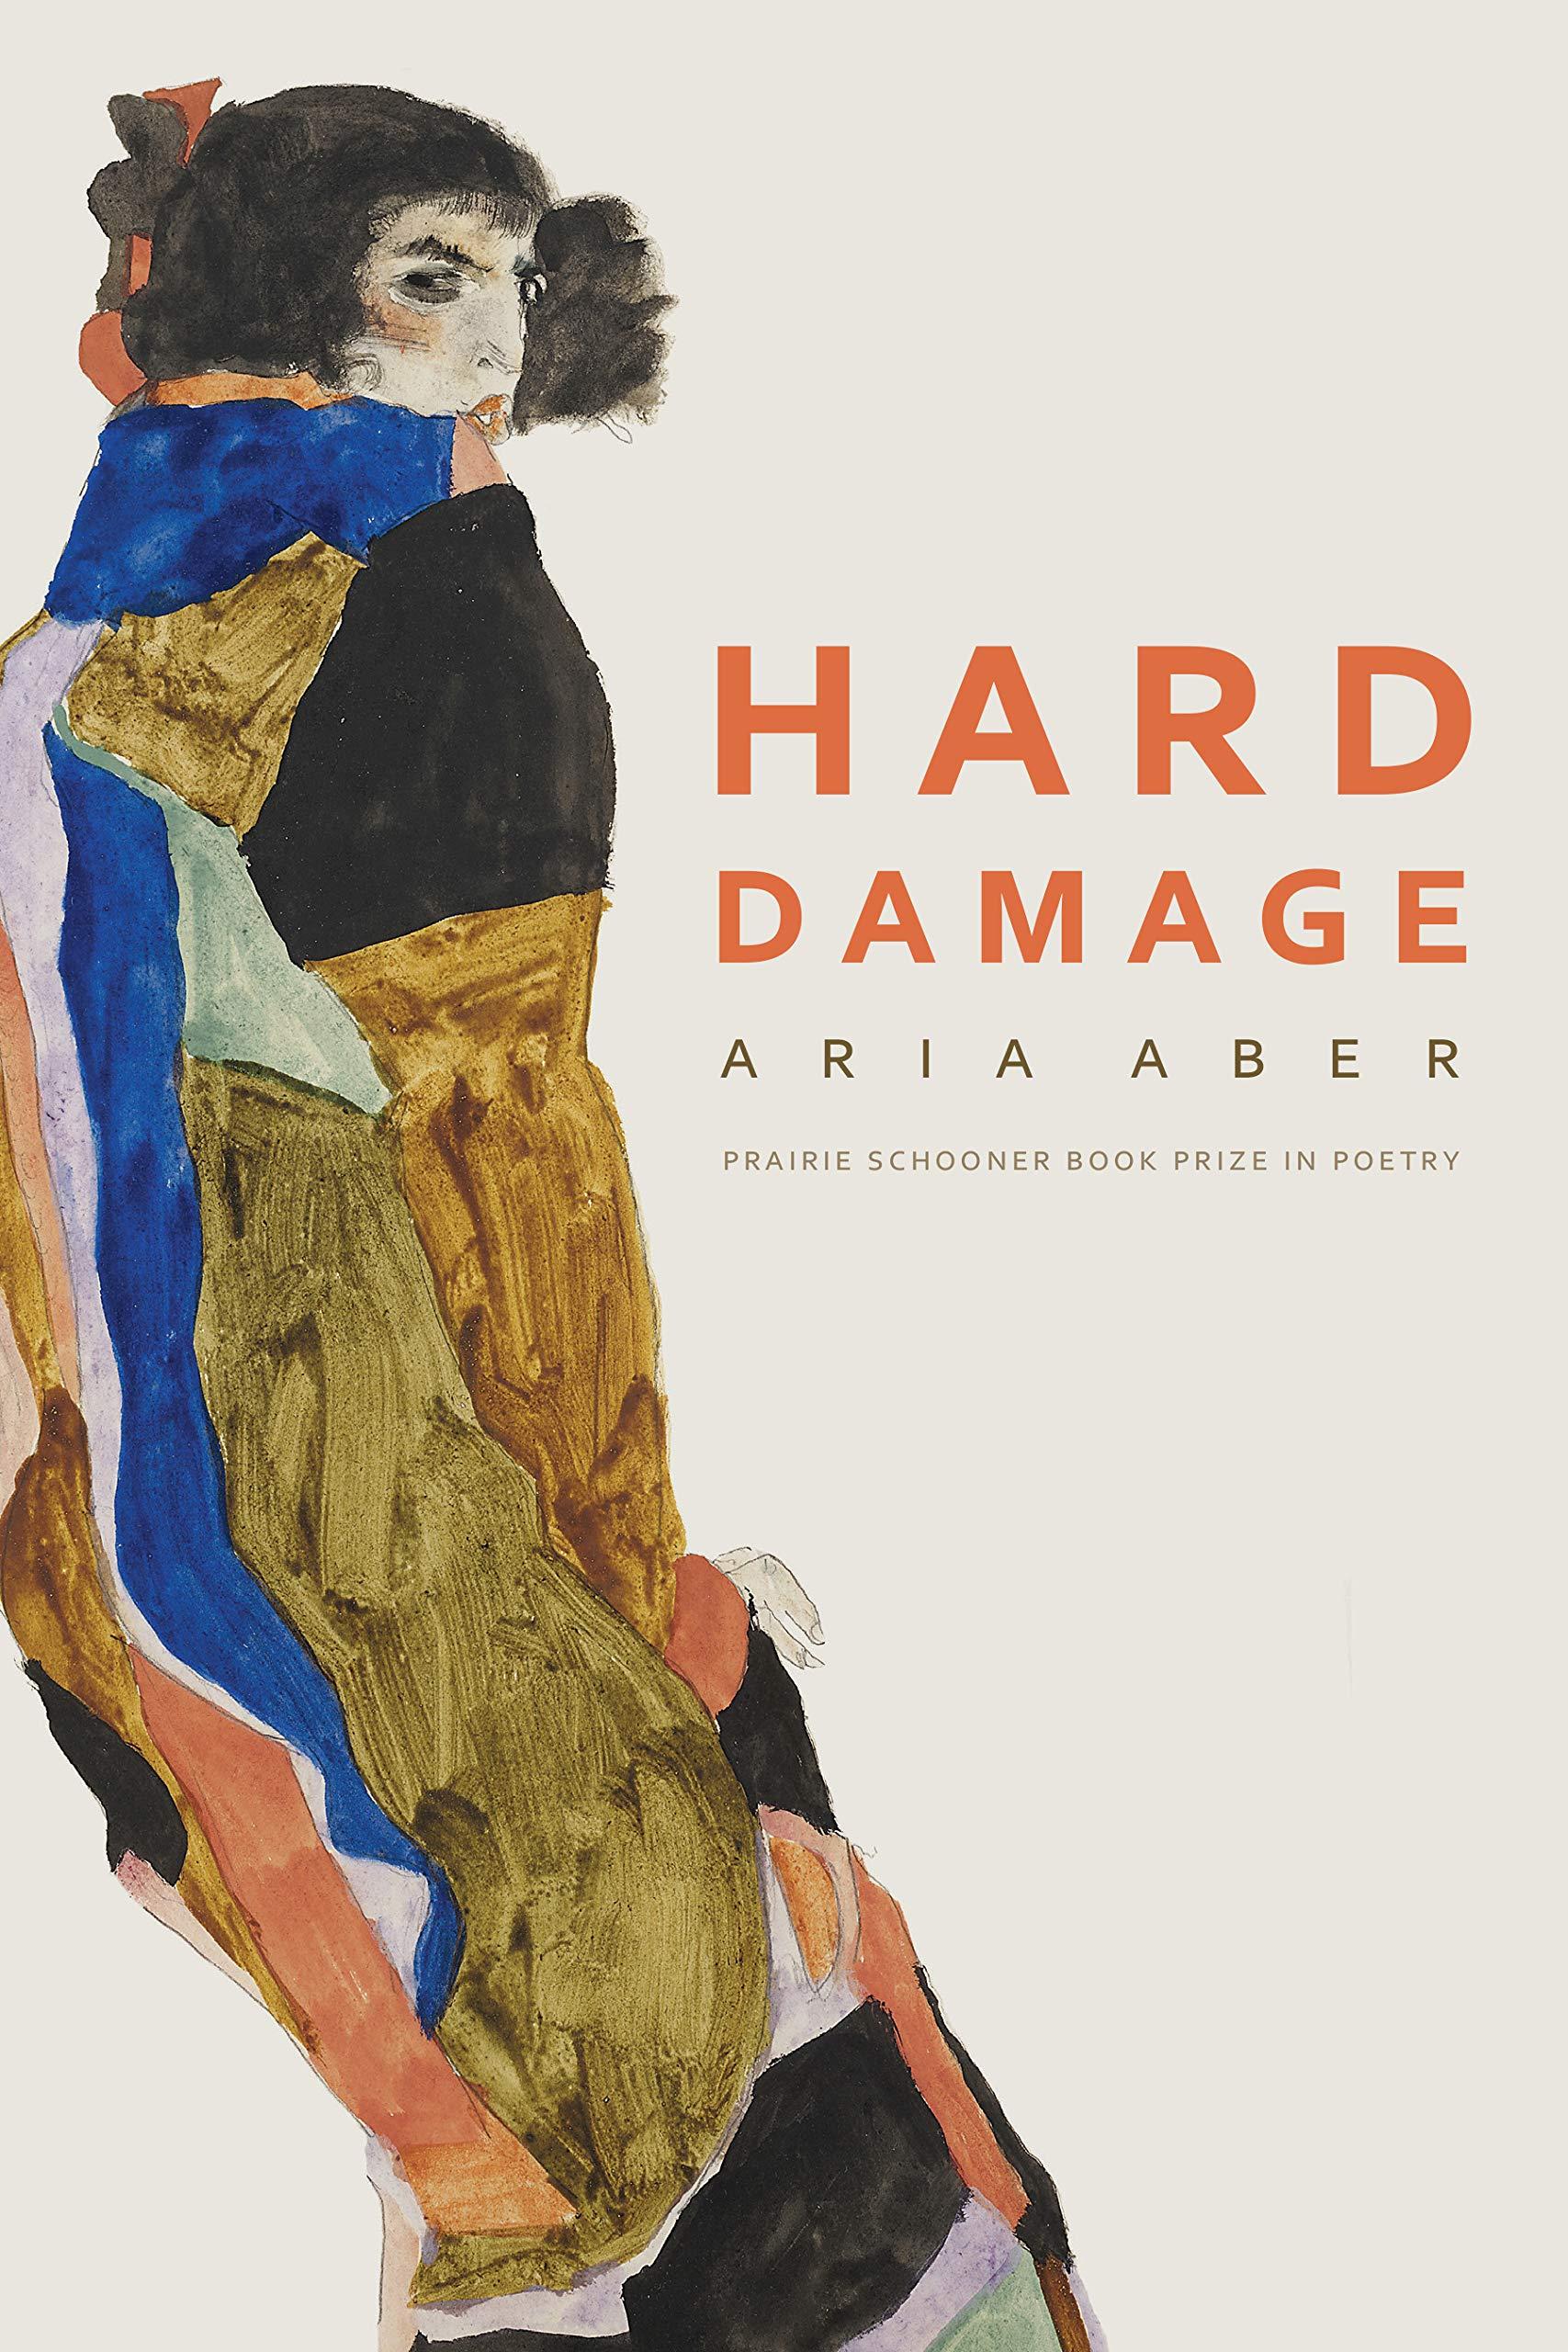 Hard Damage (Prairie Schooner Book Prize in Poetry) (English Edition)